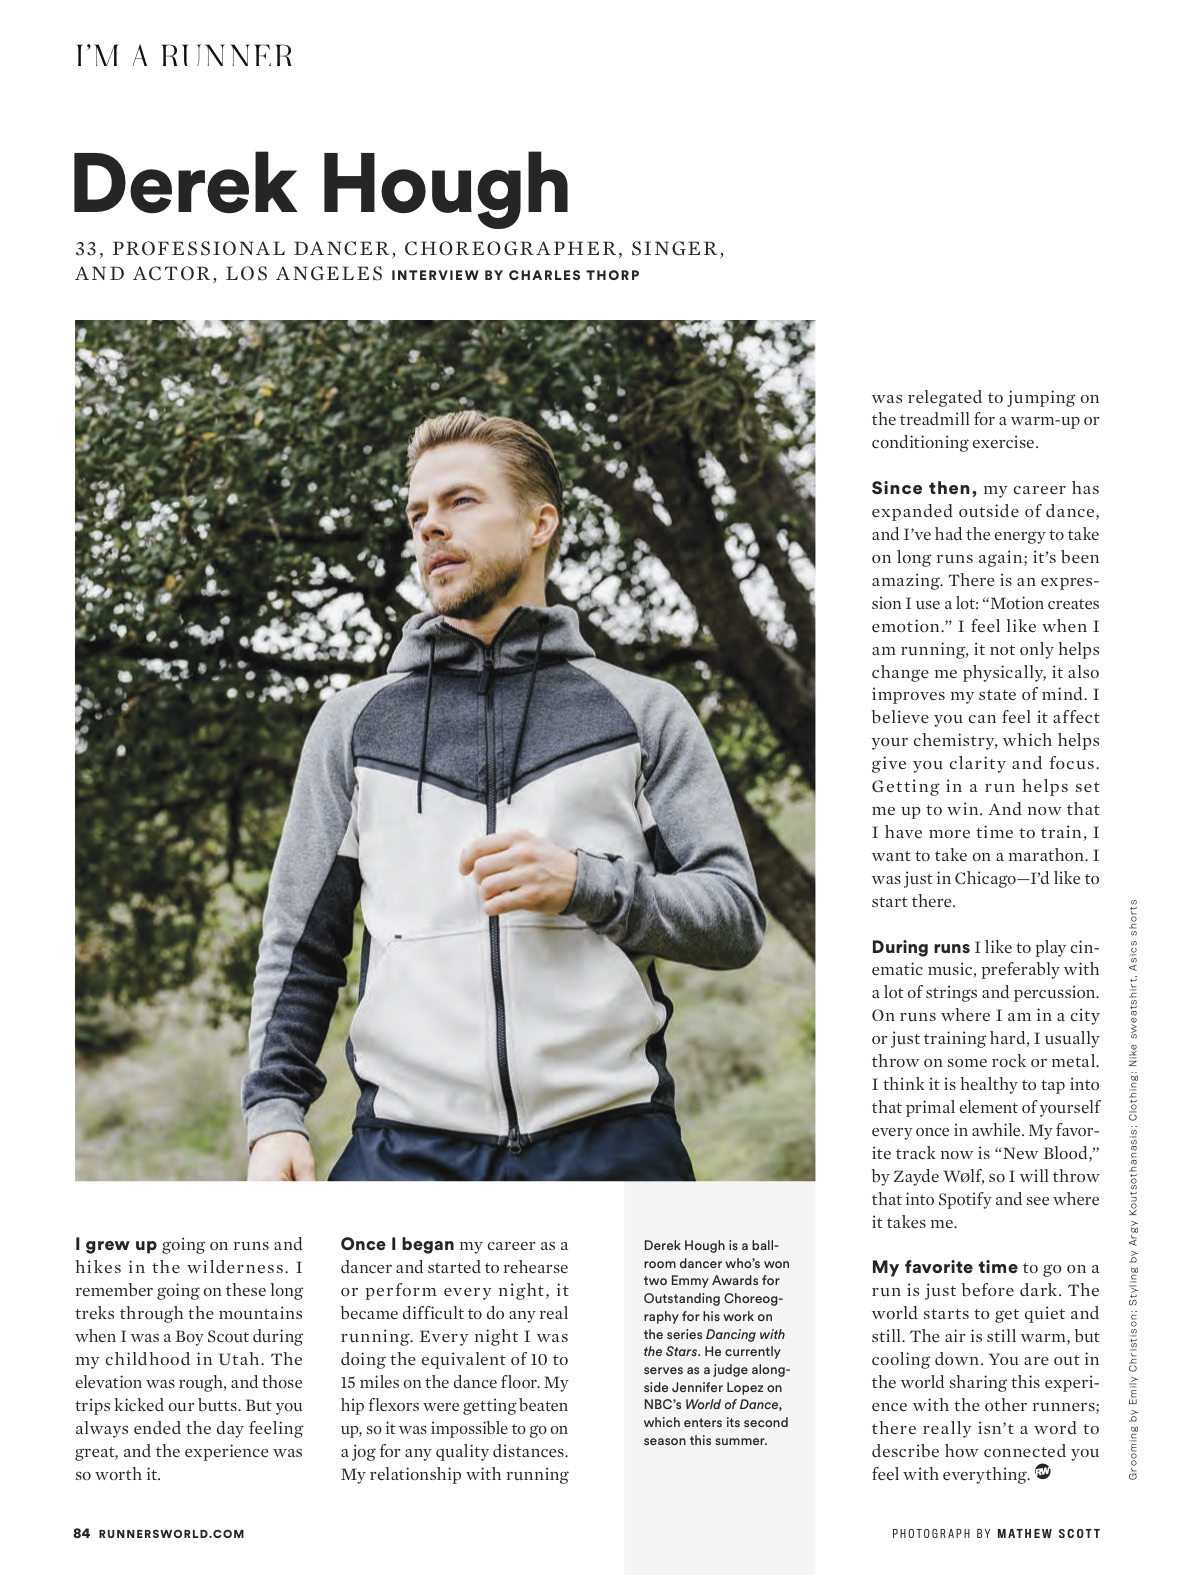 Derek Hough Runners World.jpg